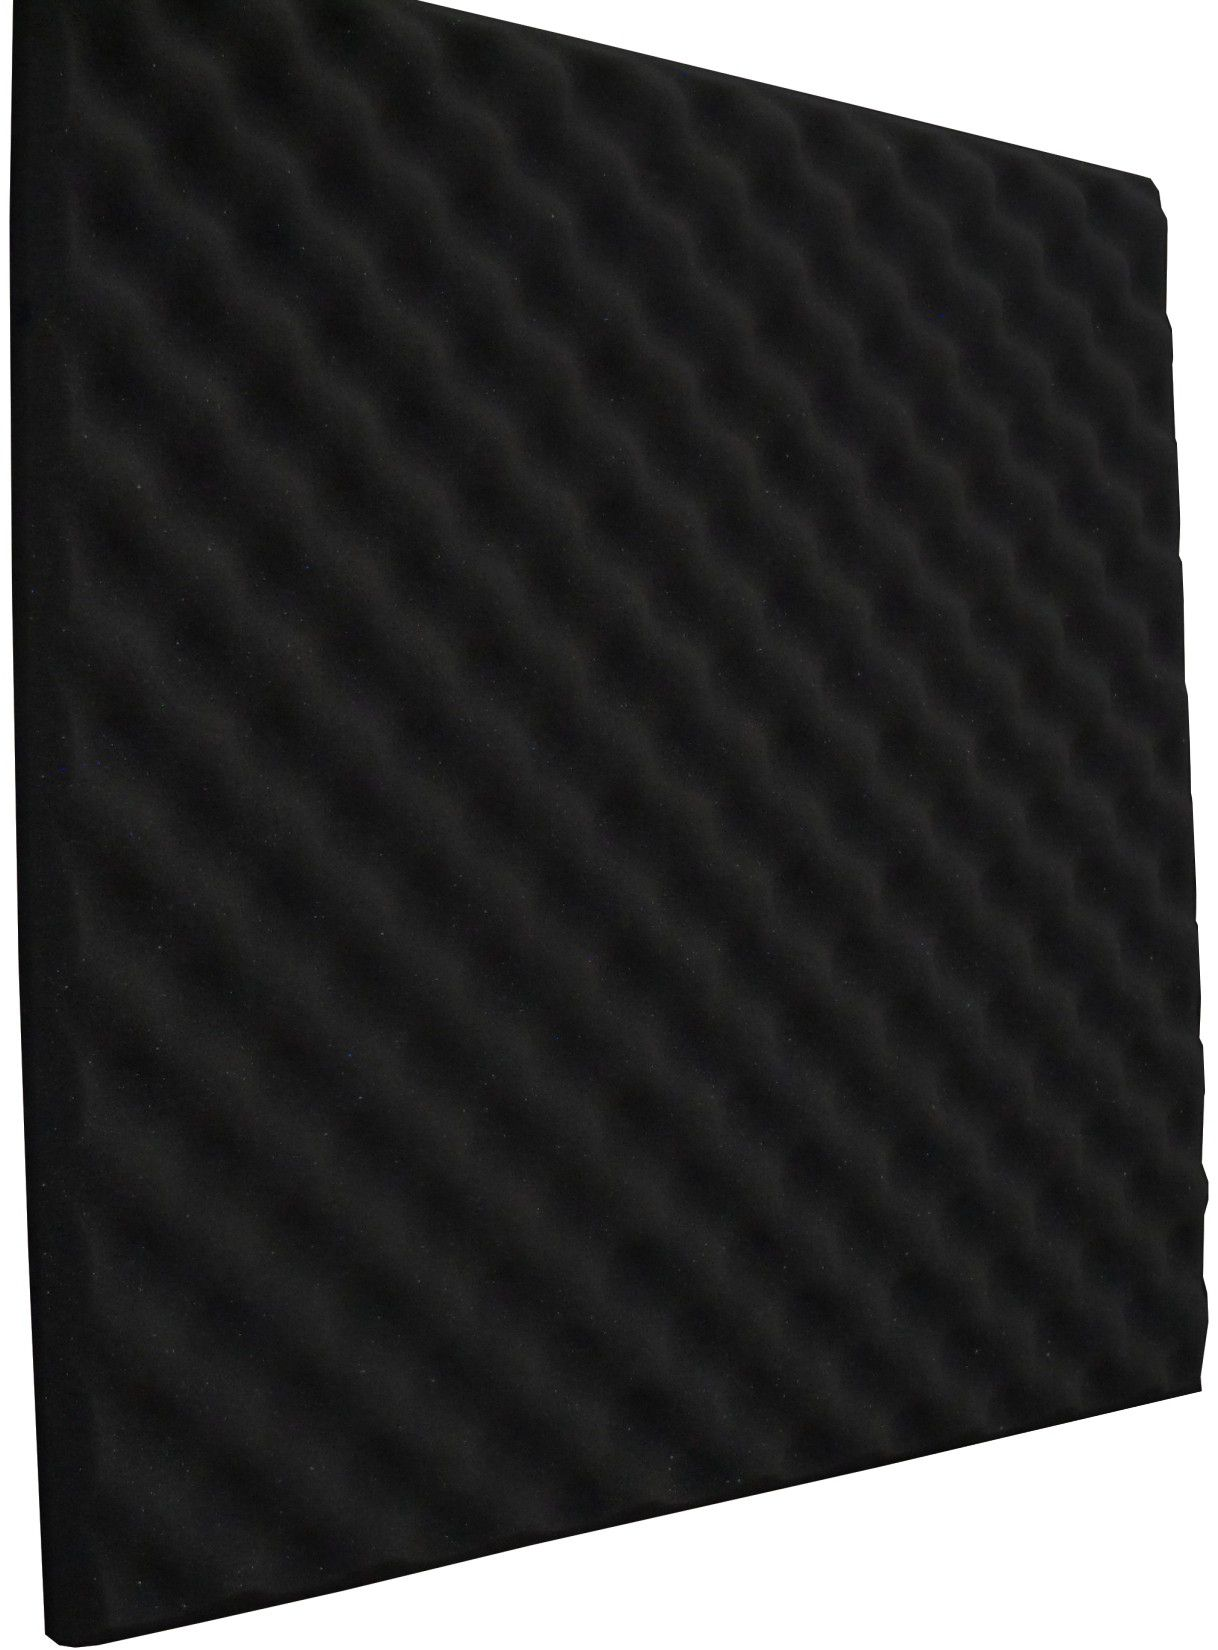 Espuma perfilada - Kit 8 peças - Preto-30mm-(2m²)  - Loja SPL Acústica